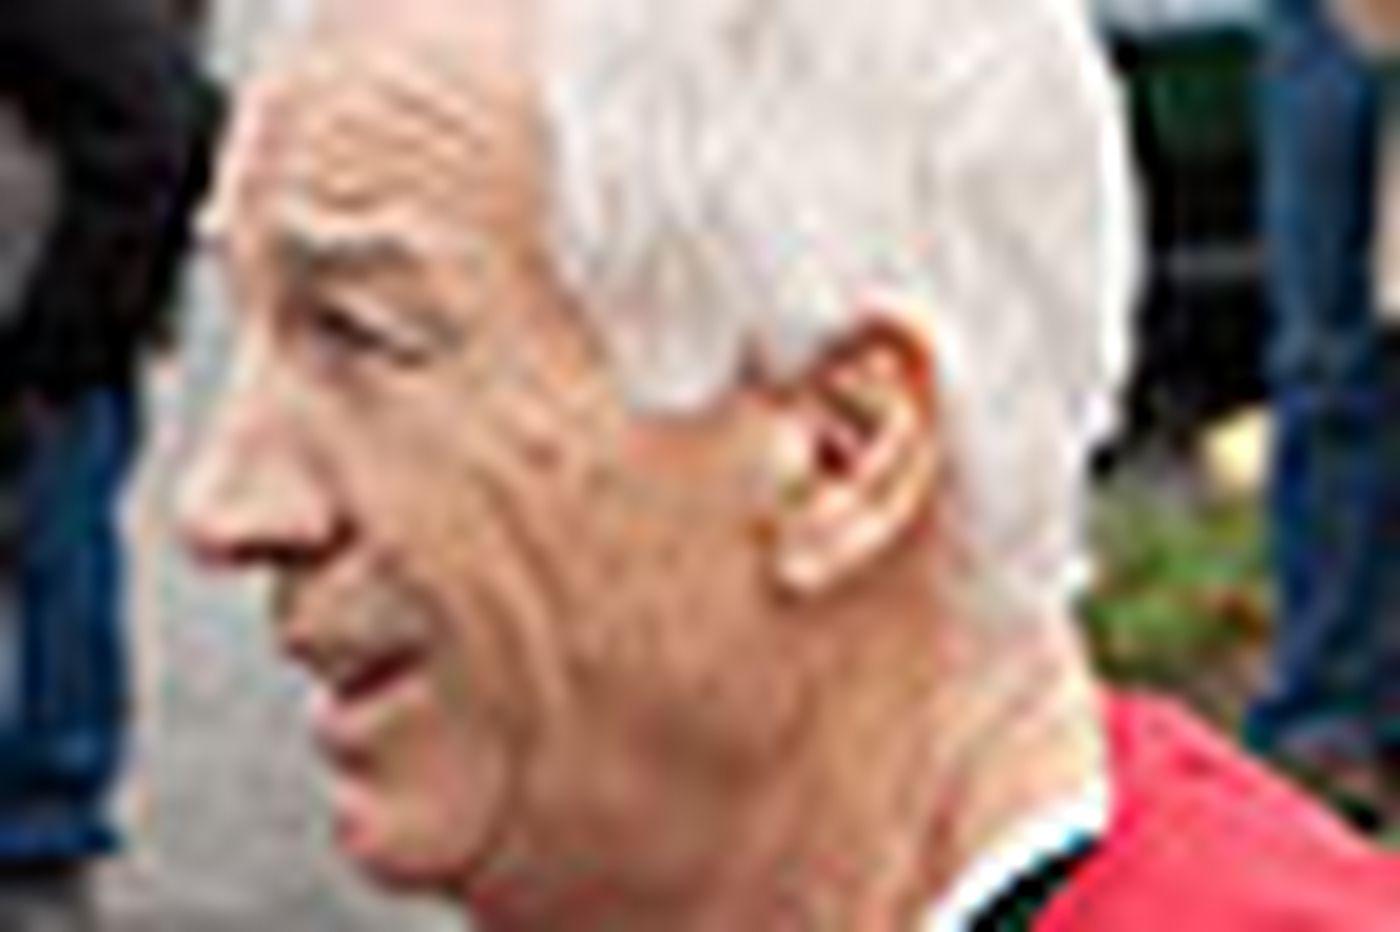 Lawyer: Man claiming to be Sandusky's 'Victim 2' a fraud